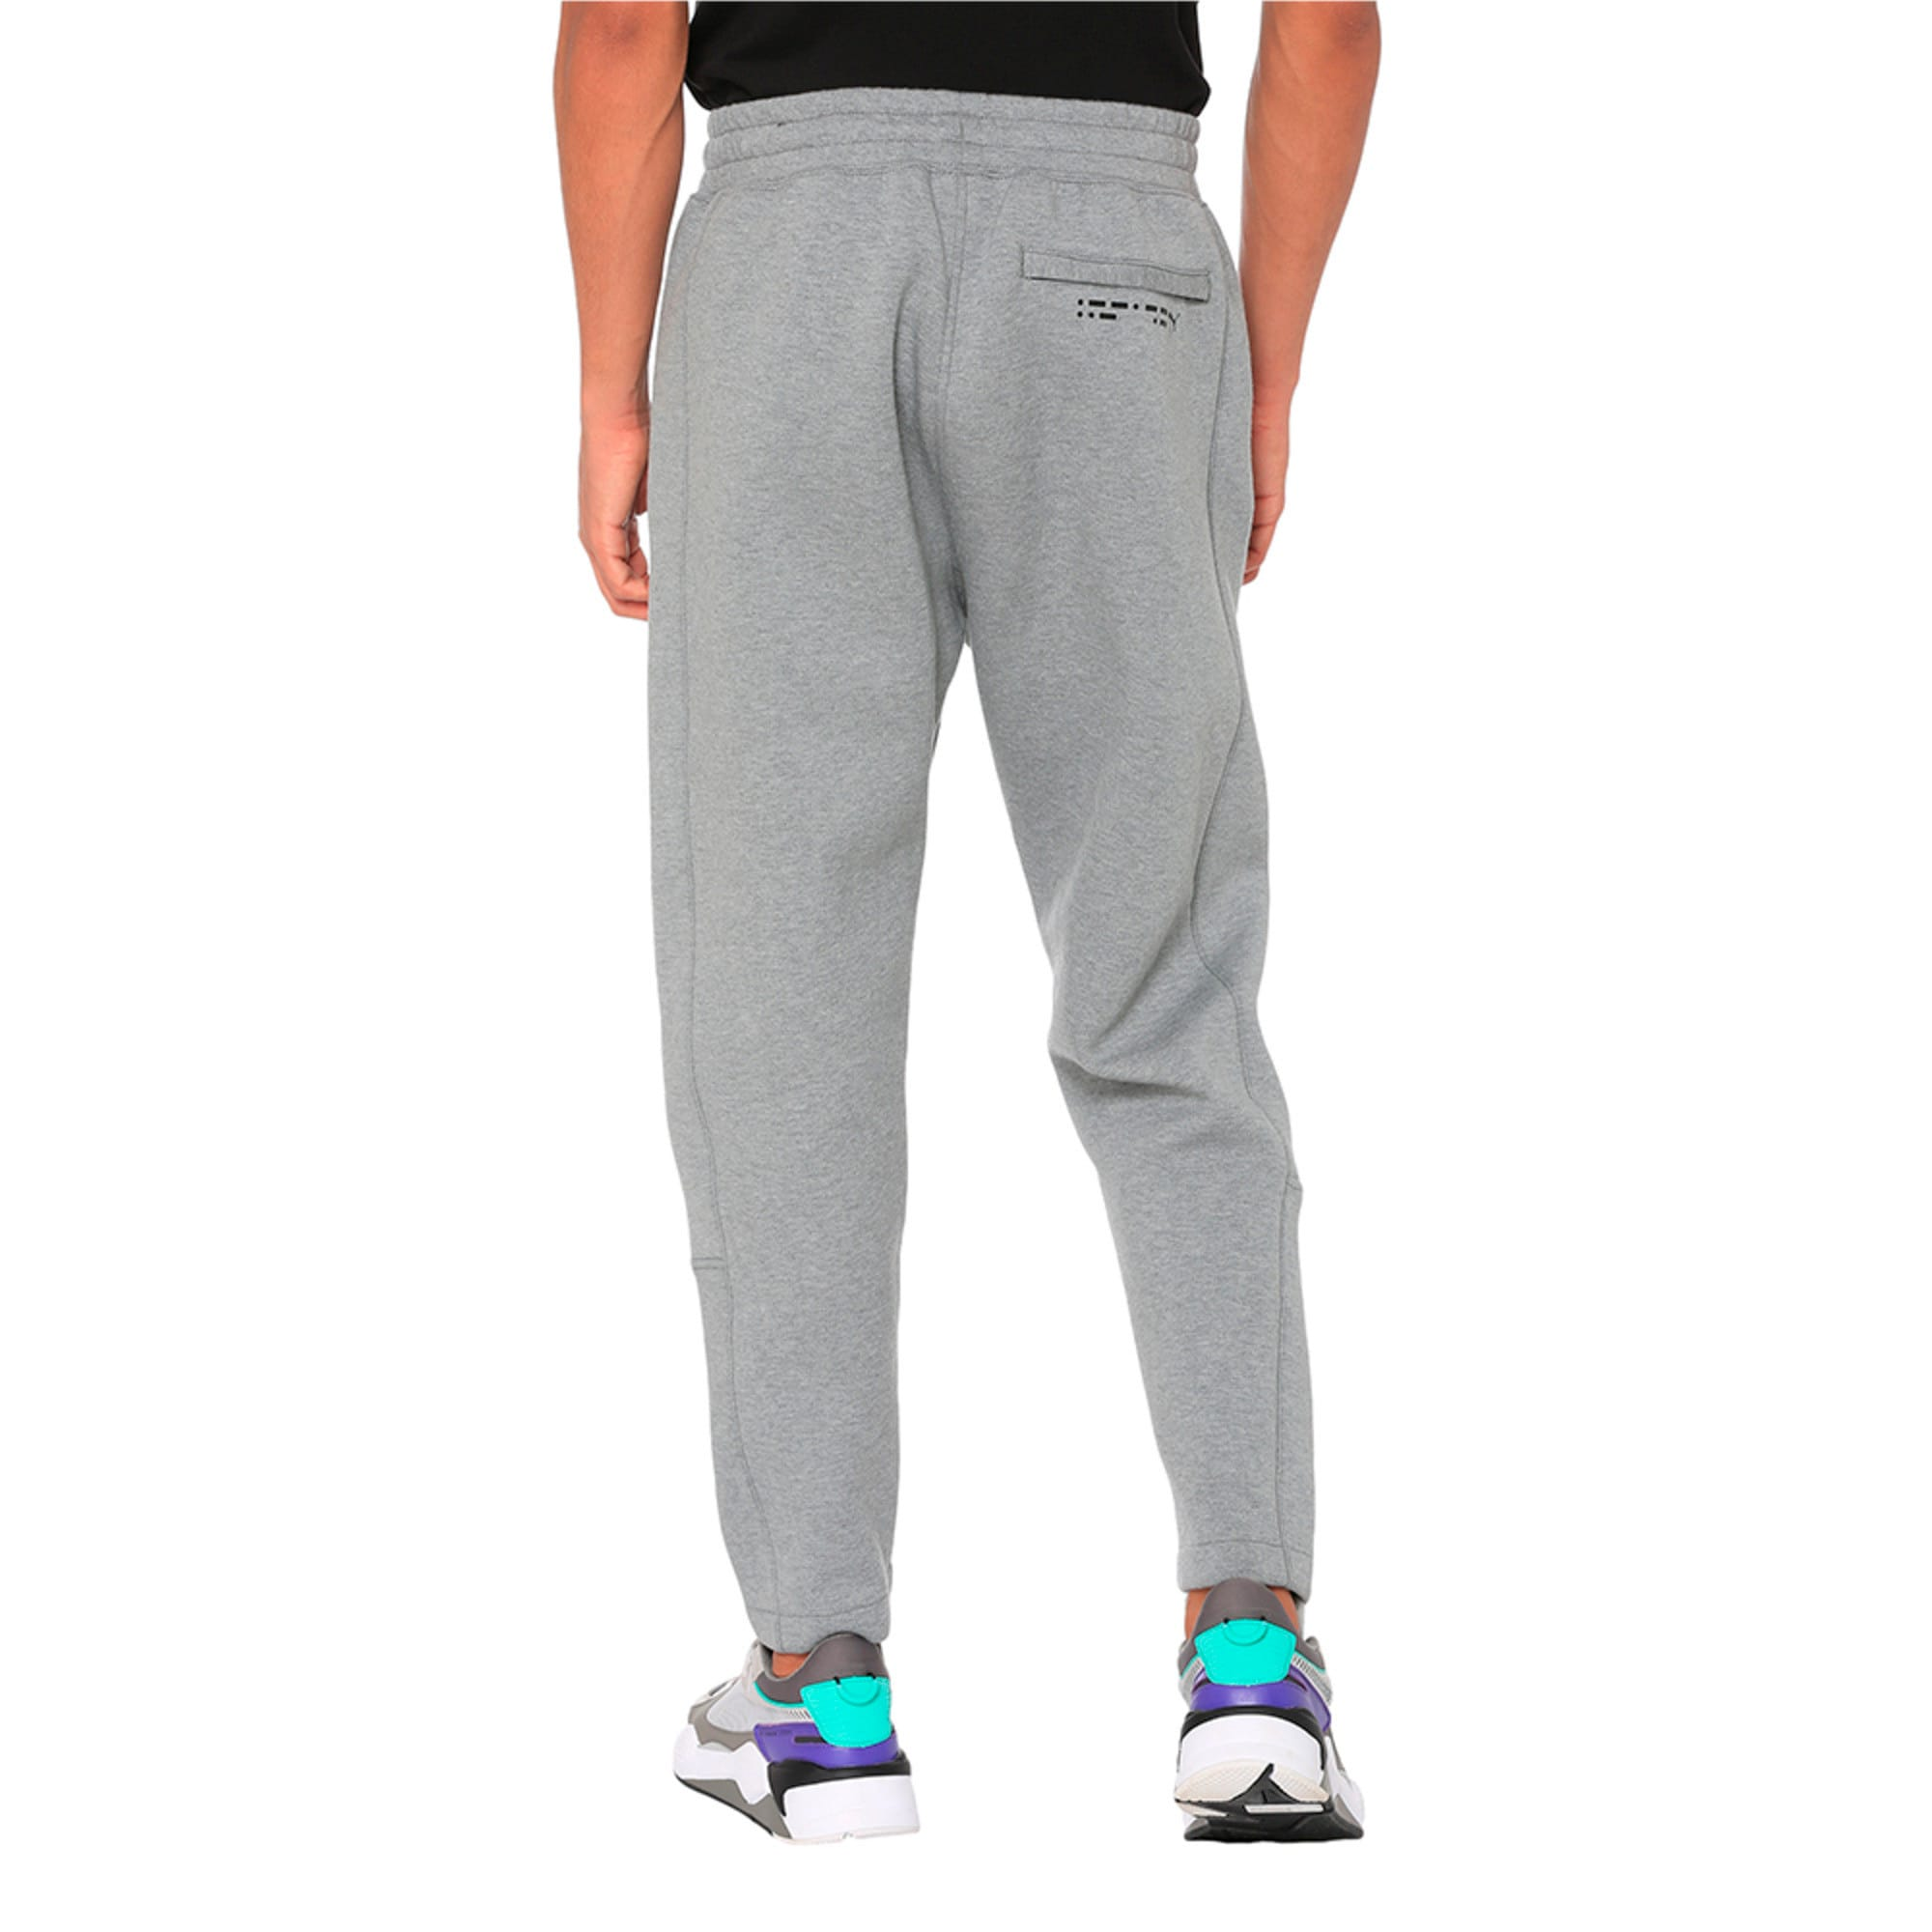 Thumbnail 3 of Epoch Knitted Men's Pants, Medium Gray Heather, medium-IND